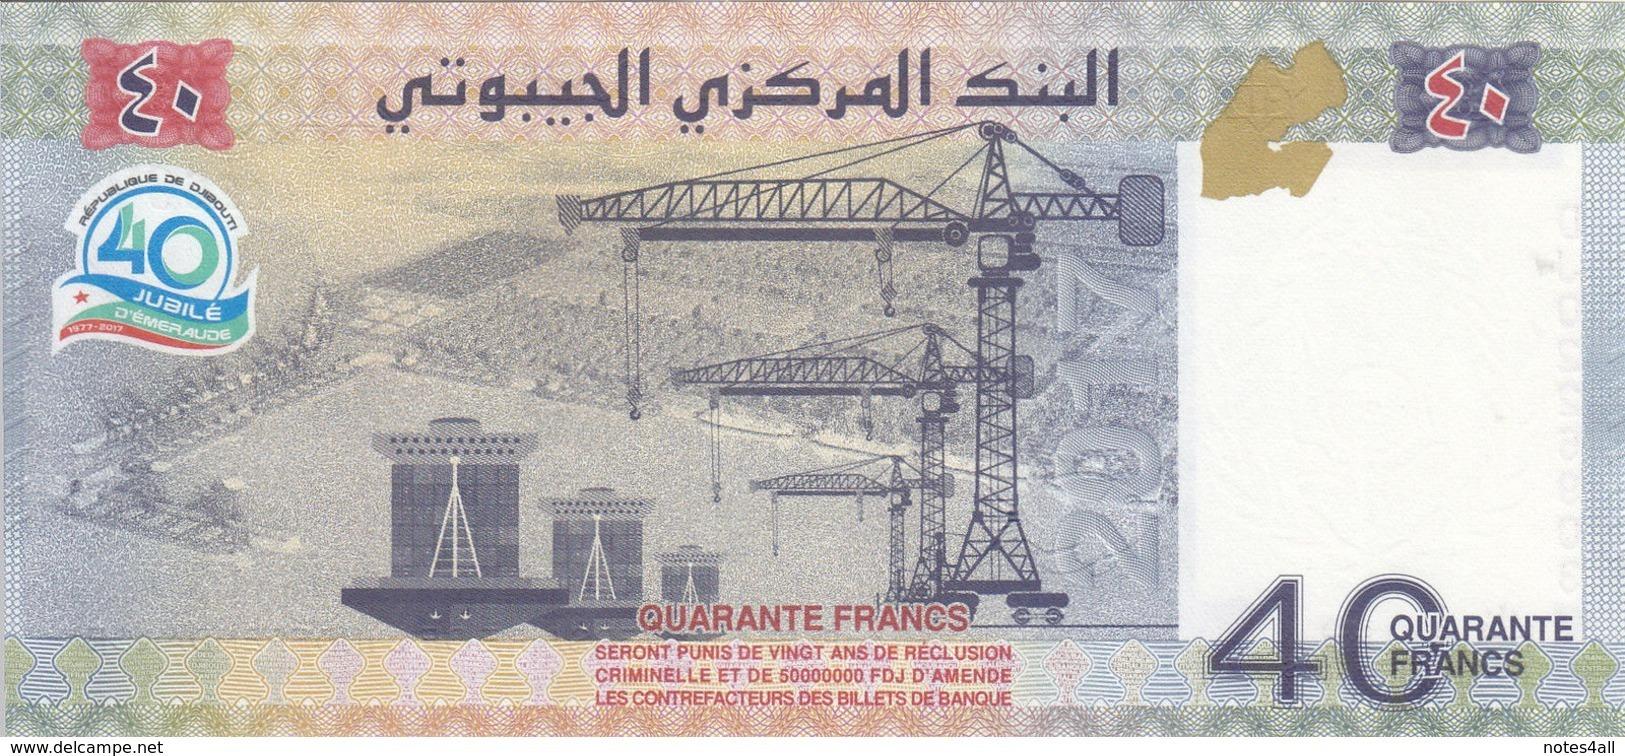 DJIBOUTI 40 FRANCS 2017 P-new 40th INDEPENDENCE COMMEMORATIVE LOT X5 UNC NOTES - Djibouti